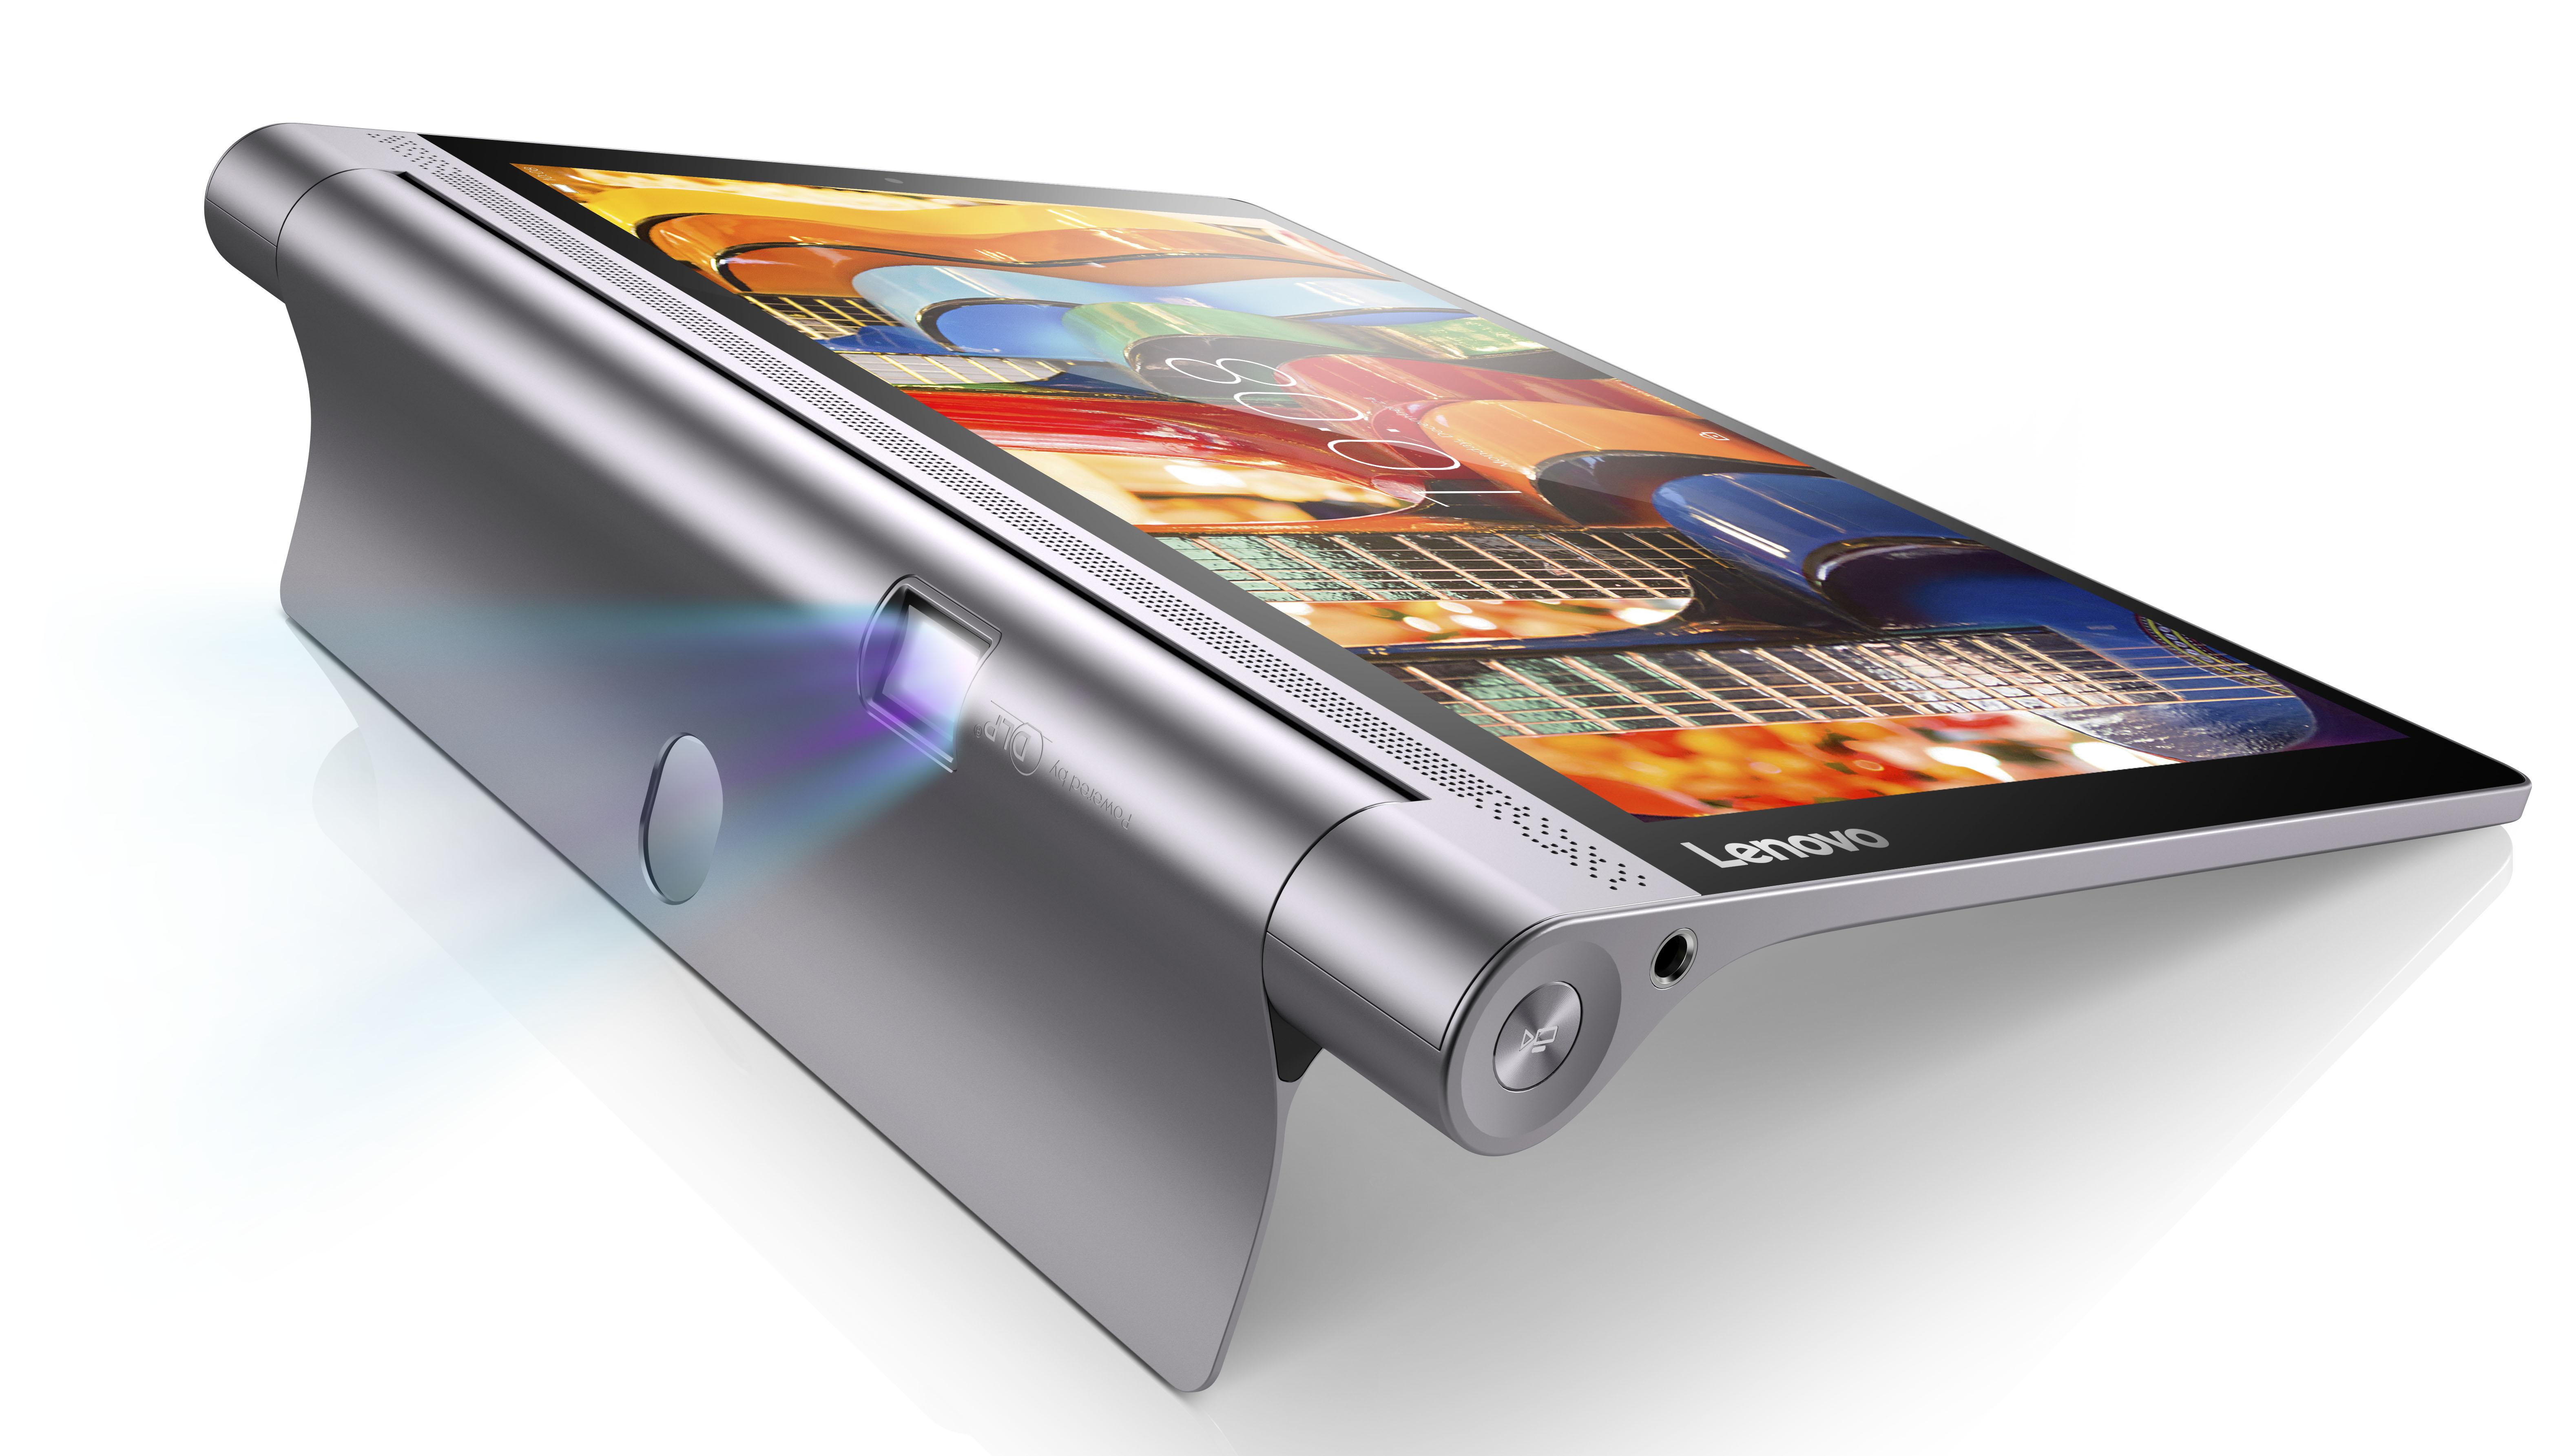 lenovo announces yoga tablet 3 yoga tablet 3 pro and several new smartphones at ifa 2015. Black Bedroom Furniture Sets. Home Design Ideas